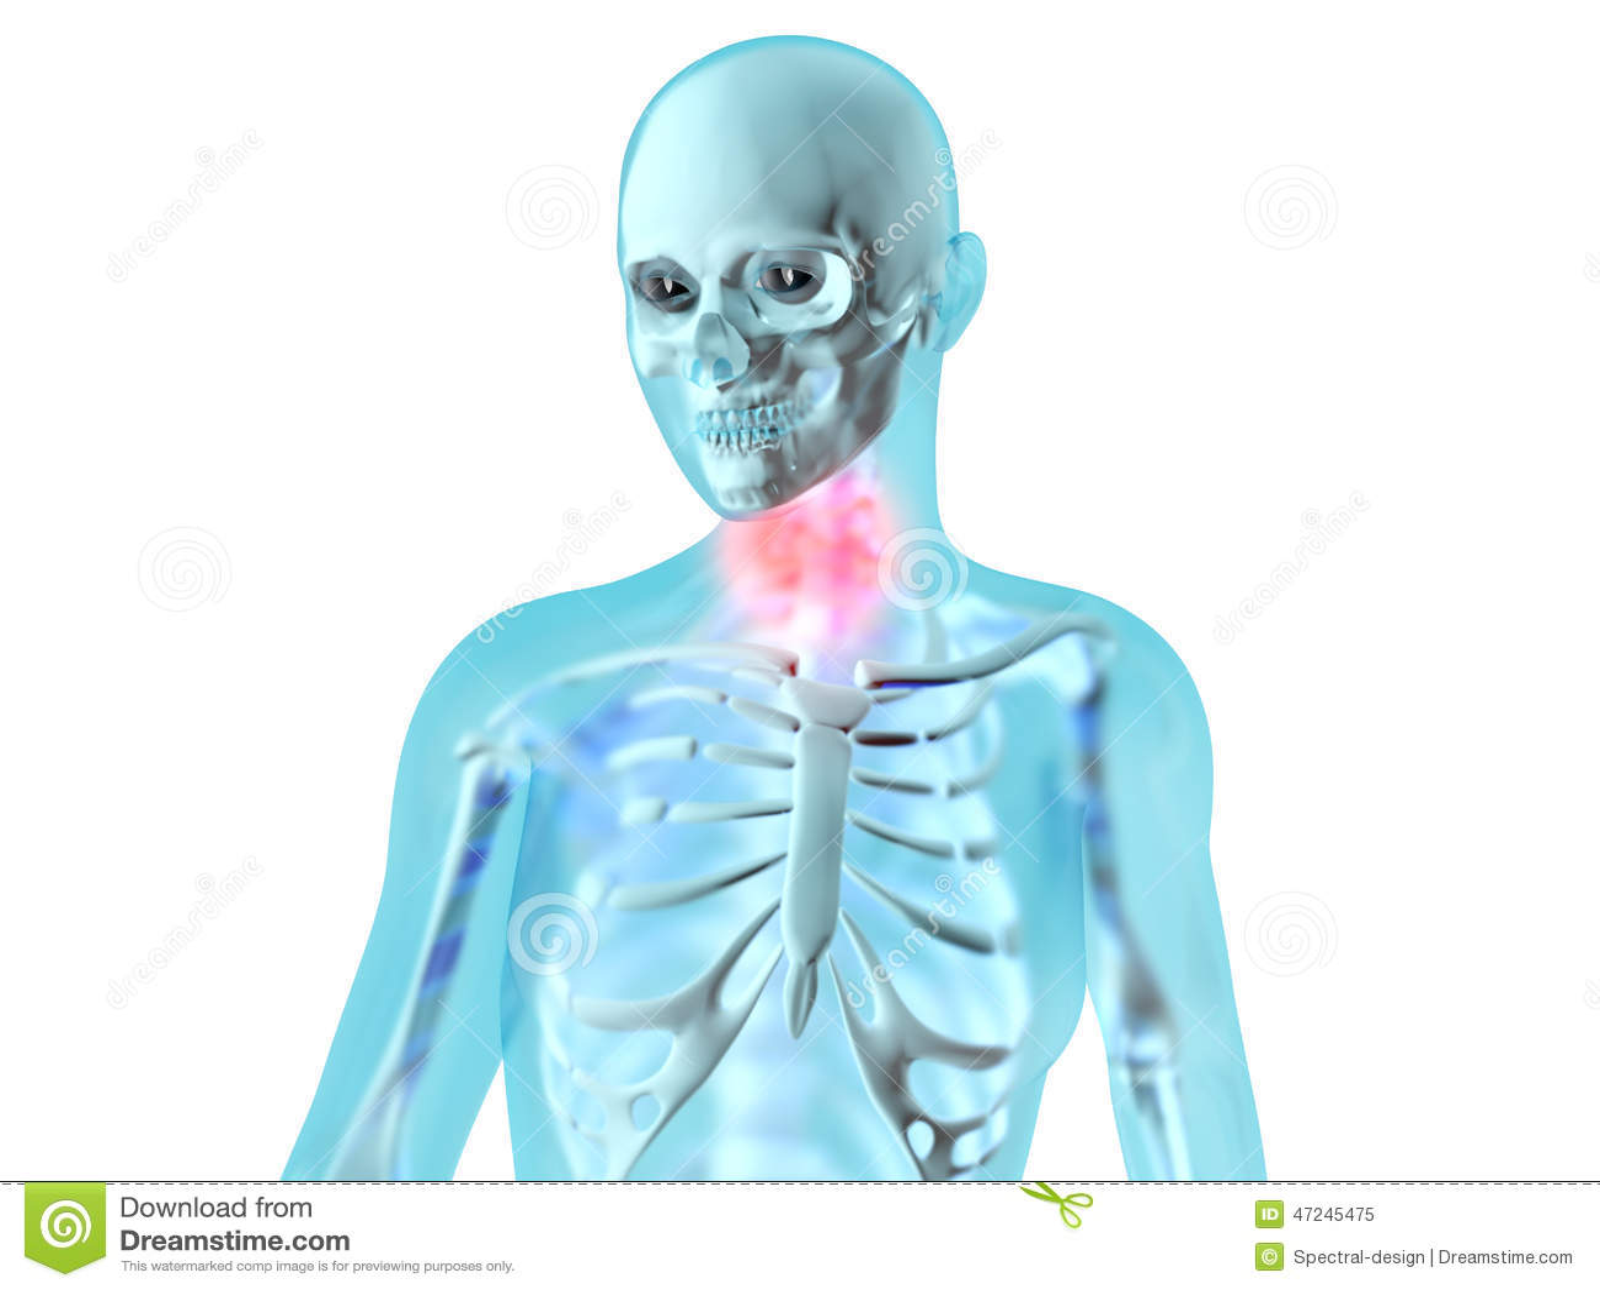 Female Anatomy - Throat Ache Stock Illustration - Illustration of ...